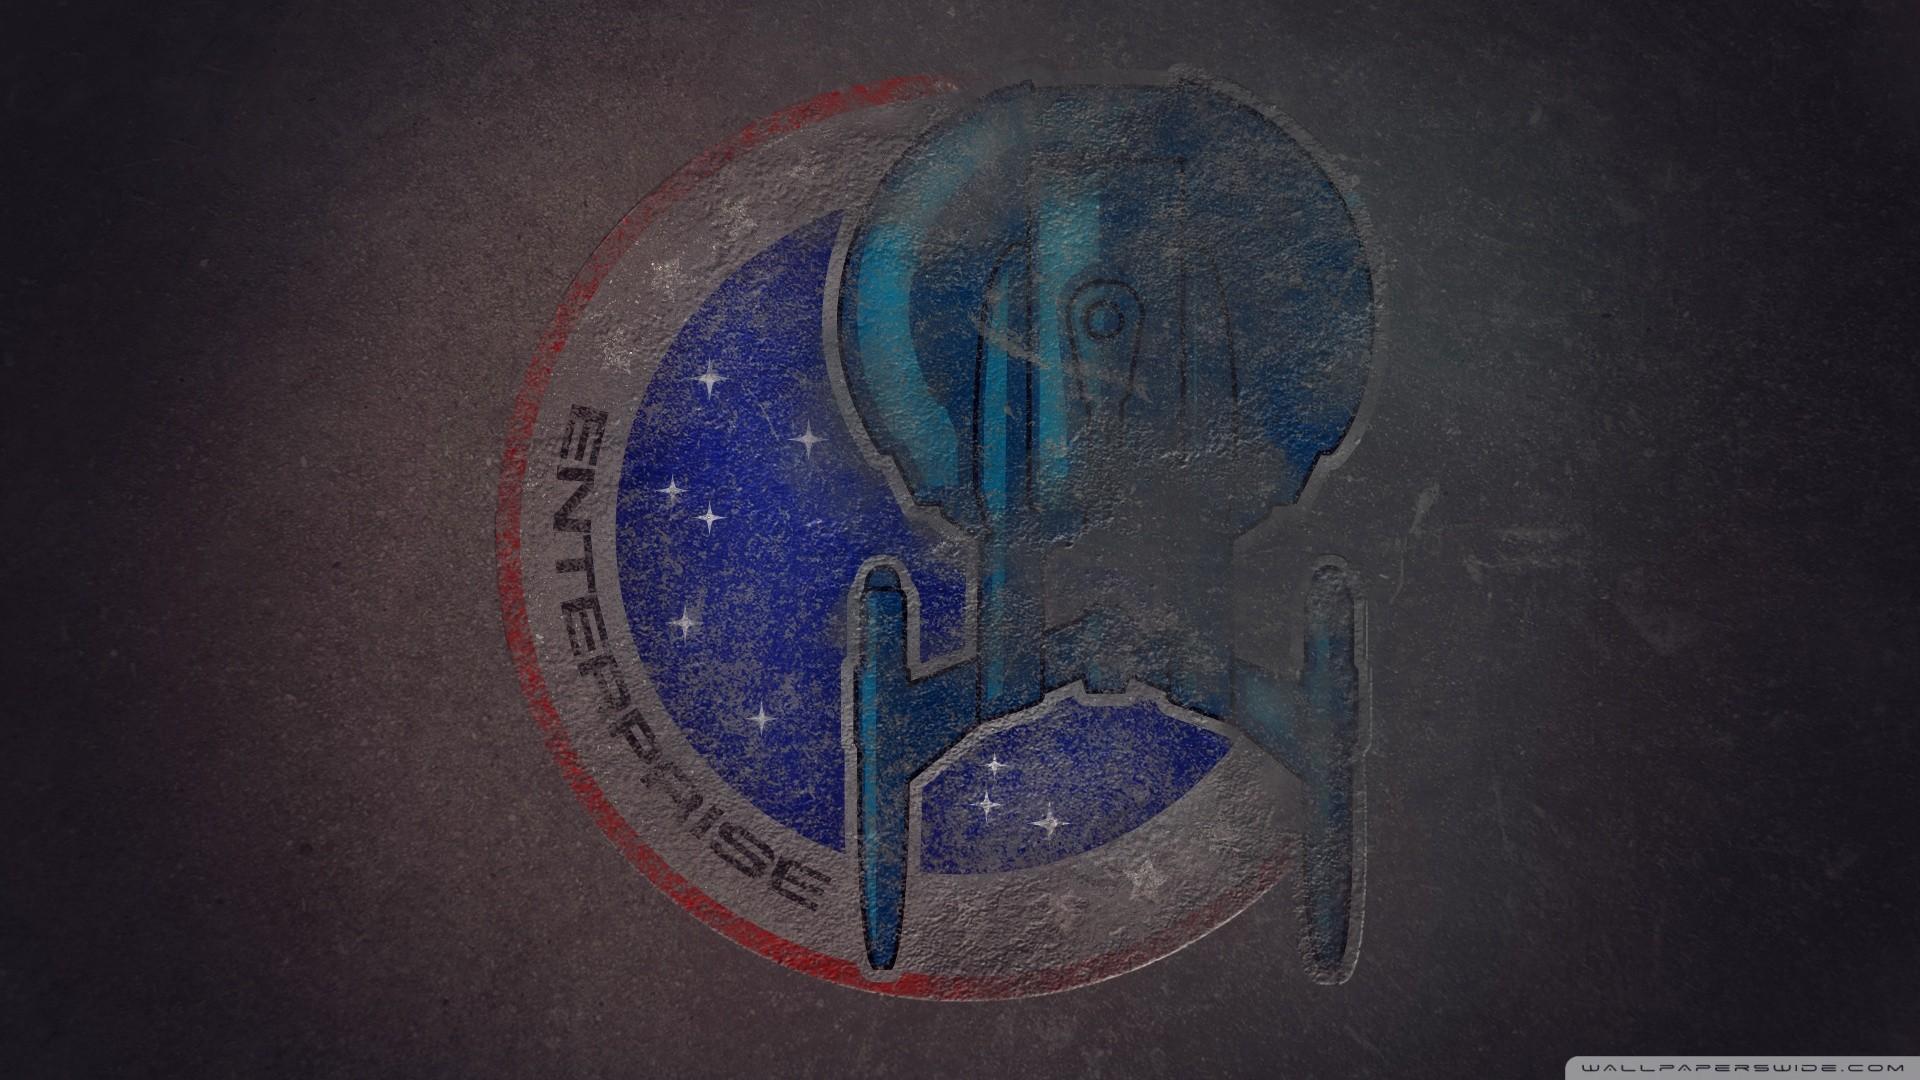 Star Trek Wallpaper 1080p (72+ Images